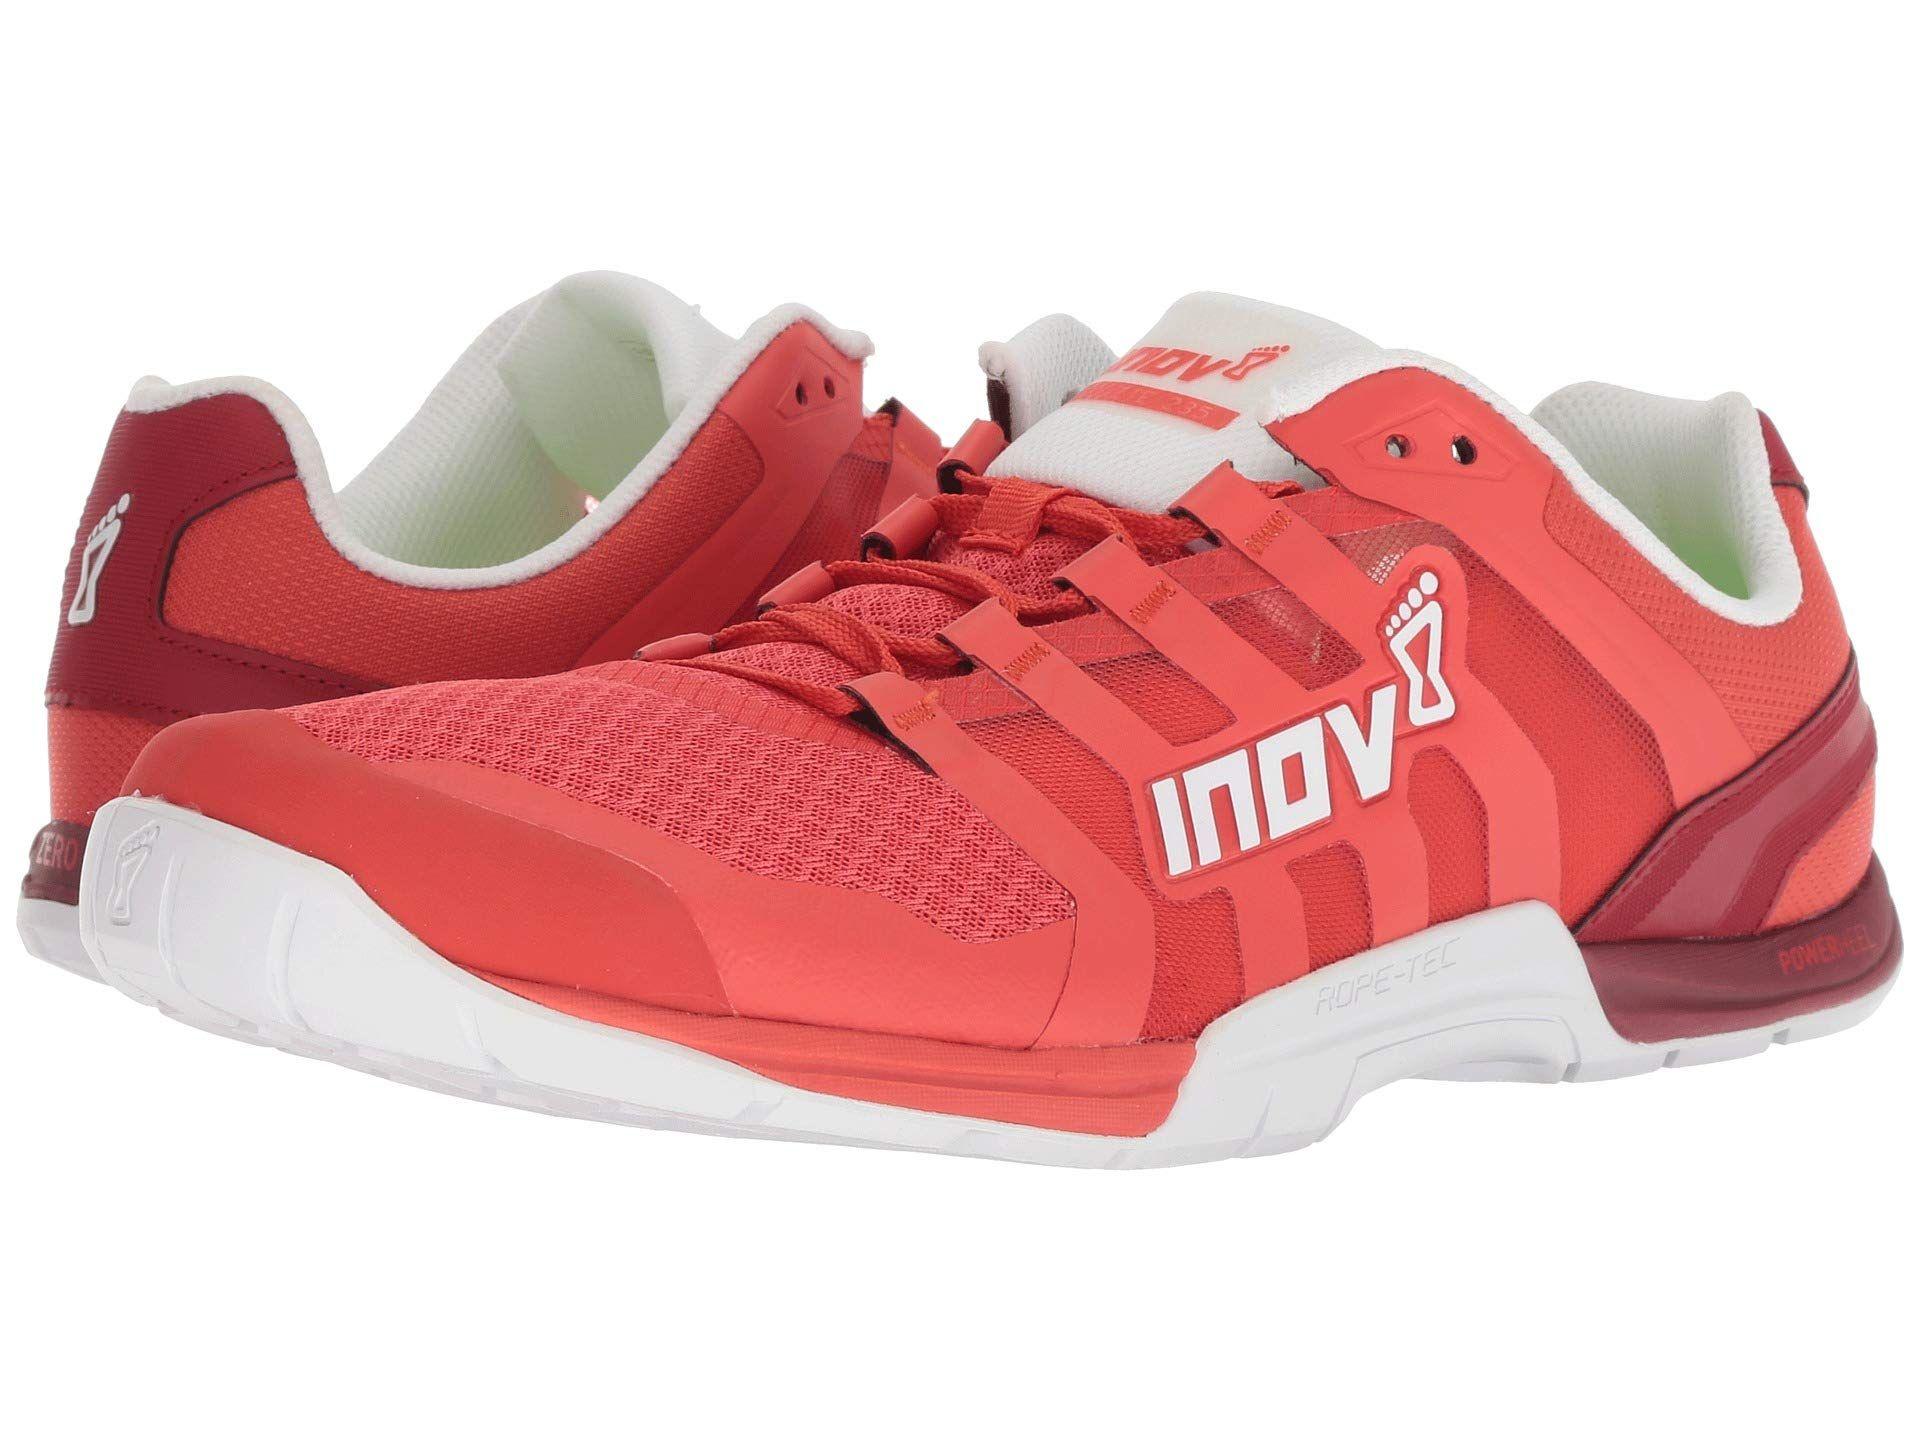 d9efabebe 12 Best Shoes for CrossFit Training Workouts for Men 2019